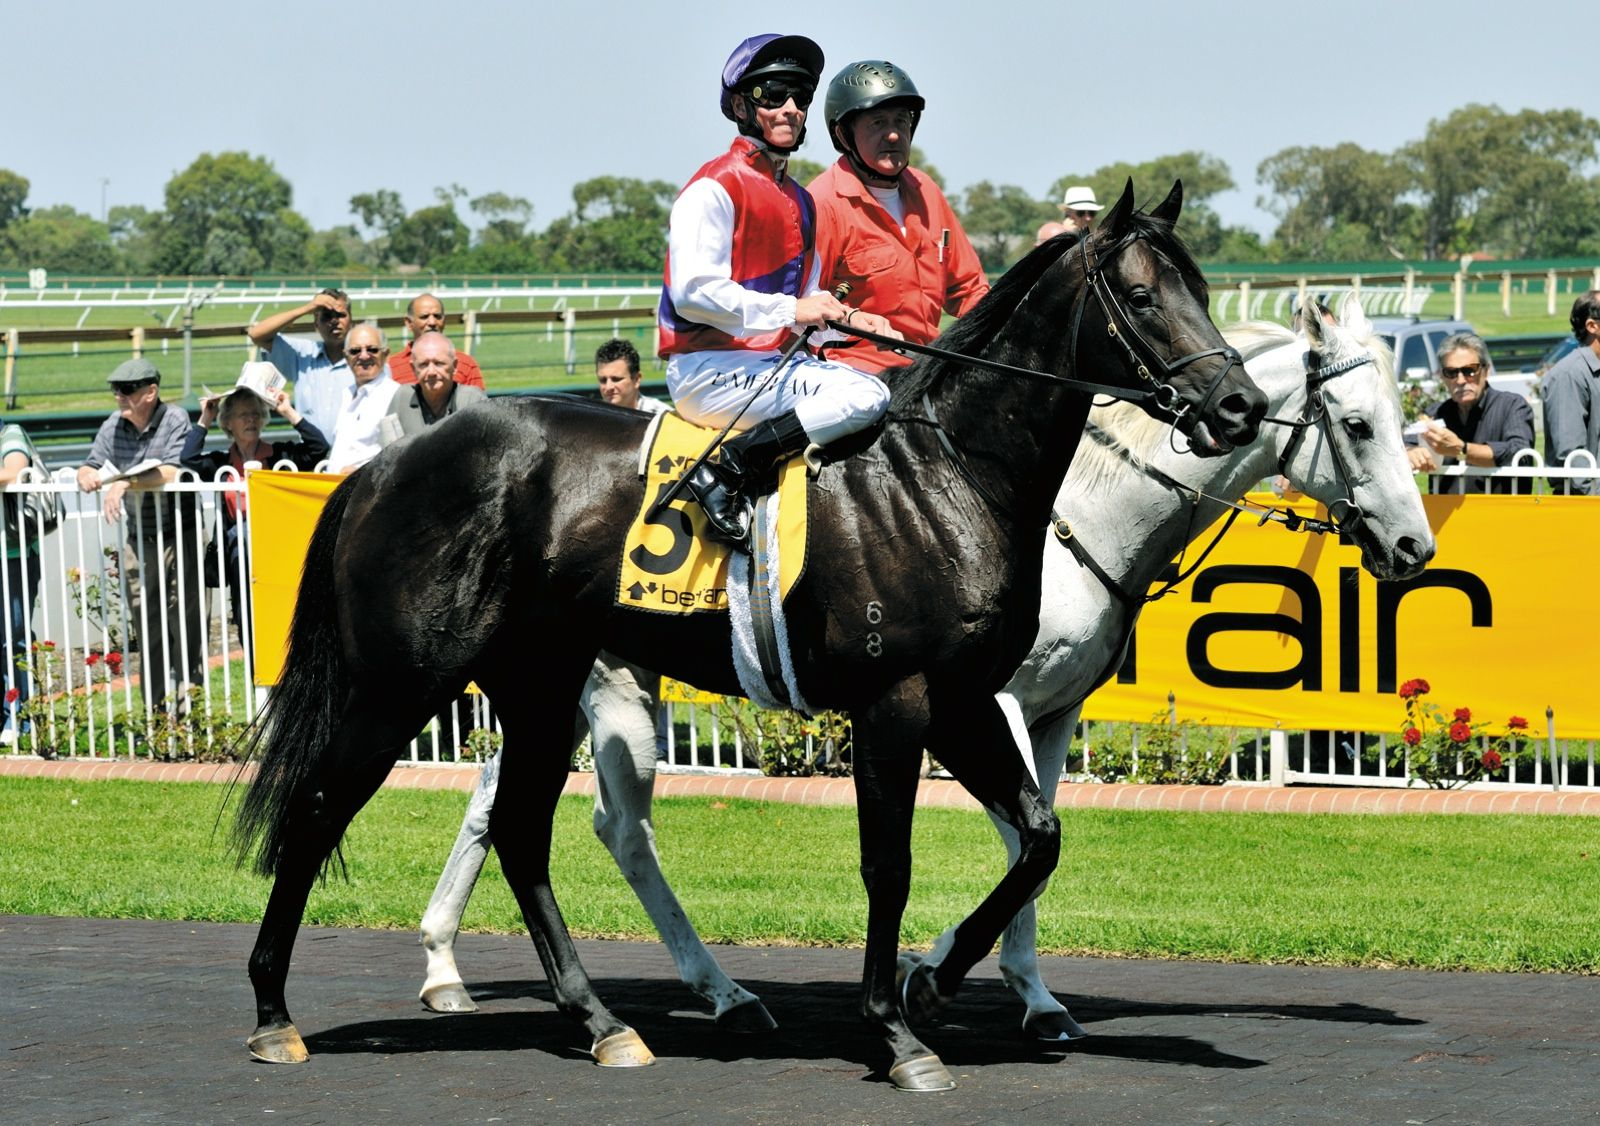 Thoroughbred horse, Quarter horse